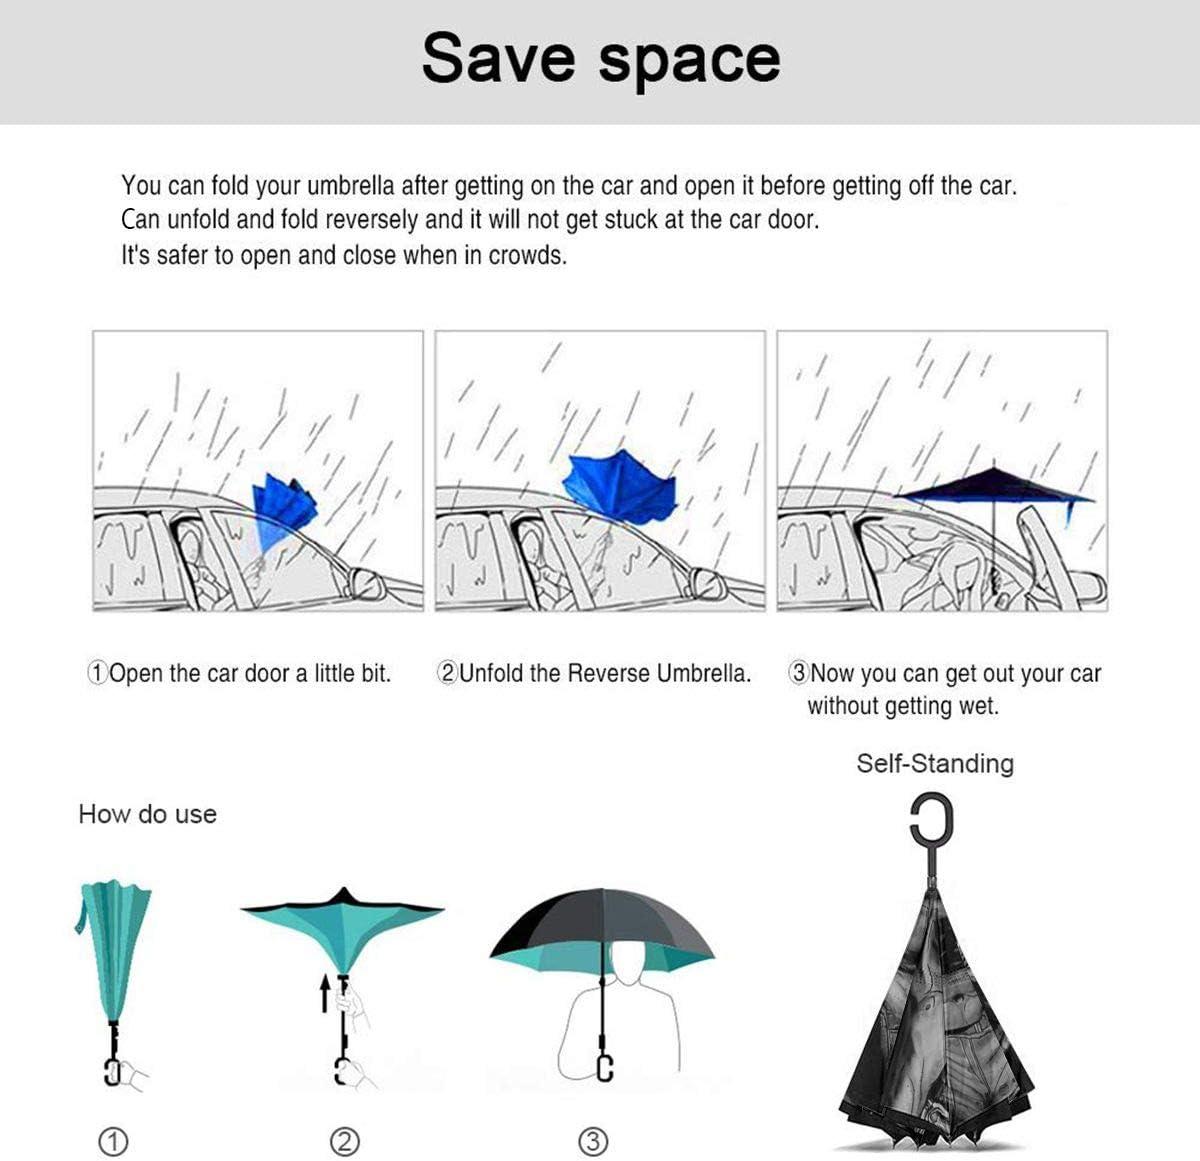 Game Borderlands Car Reverse Umbrella Windproof And Rainproof Double Folding Inverted Umbrella With C-Shaped Handle UV Protection Inverted Folding Umbrellas